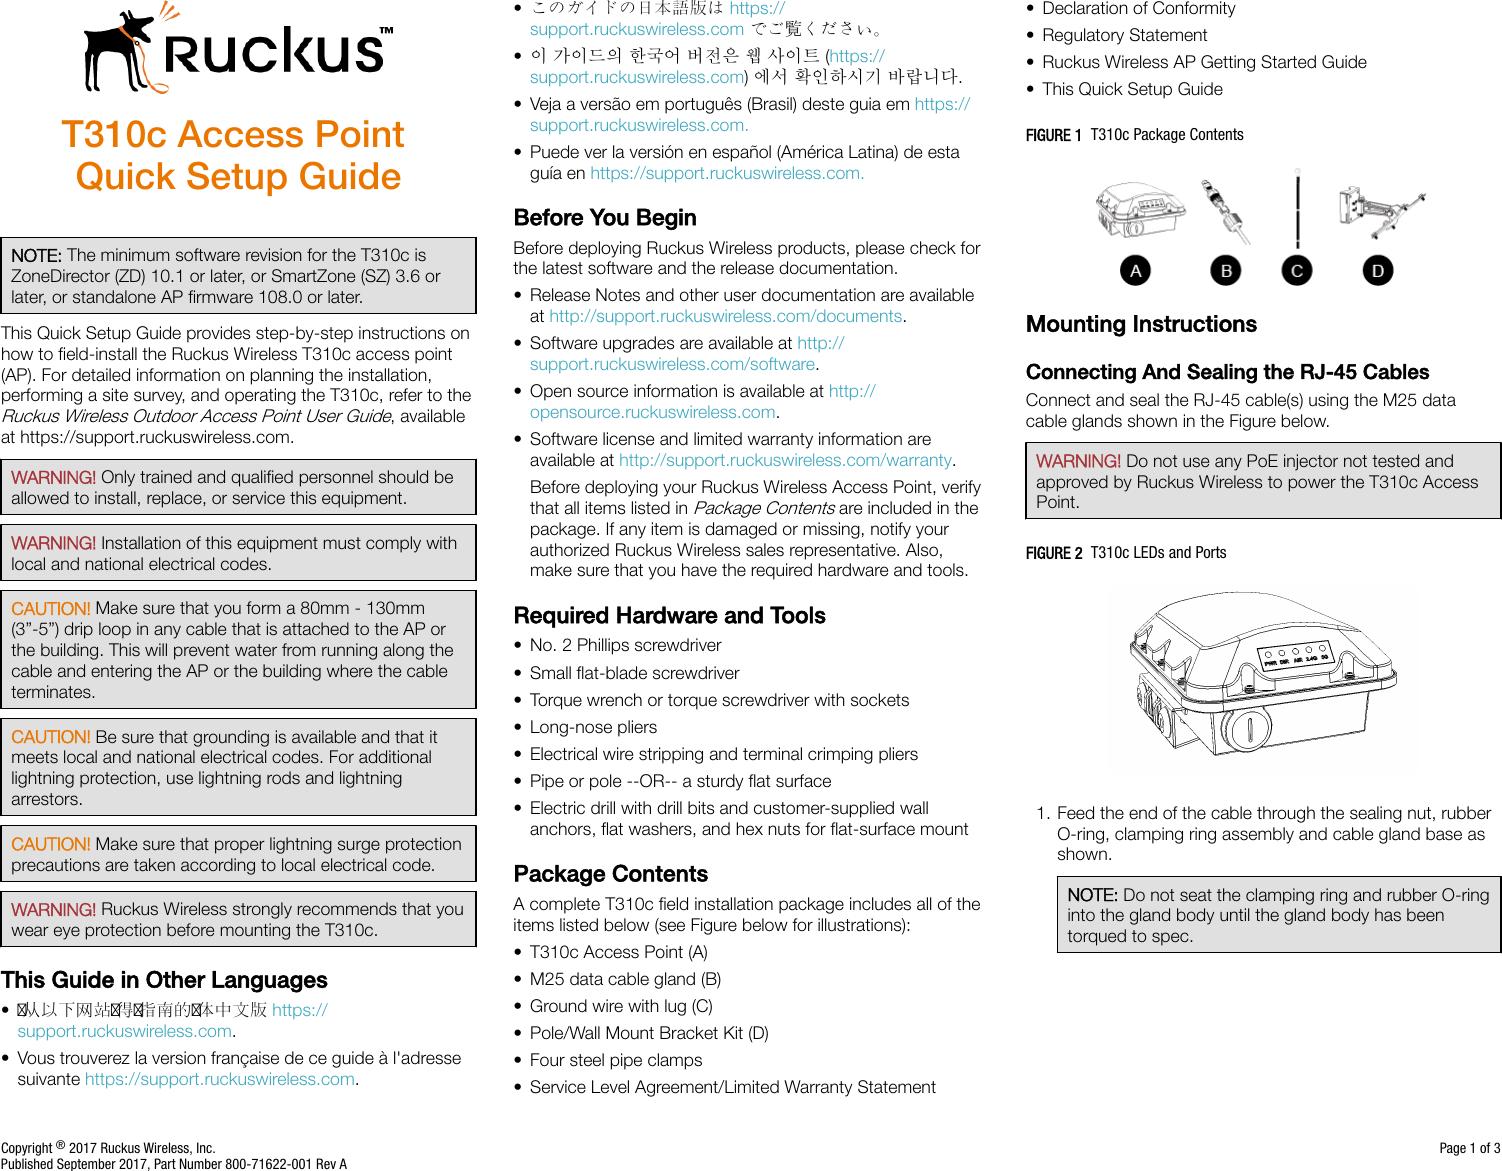 2008 ruckus Owners manual Zd 1200 Firmware Update